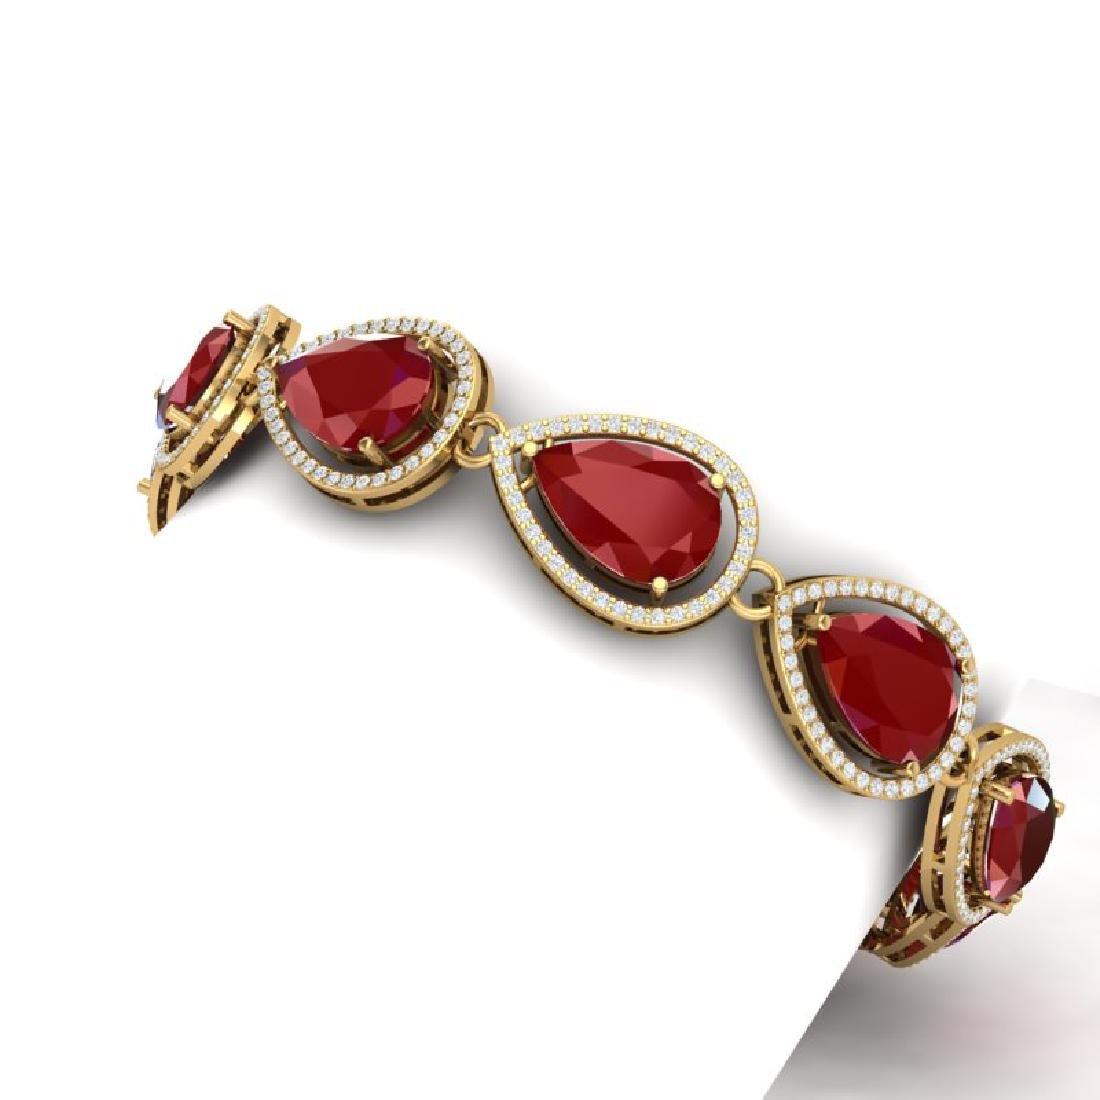 28.31 CTW Royalty Ruby & VS Diamond Bracelet 18K Yellow - 2